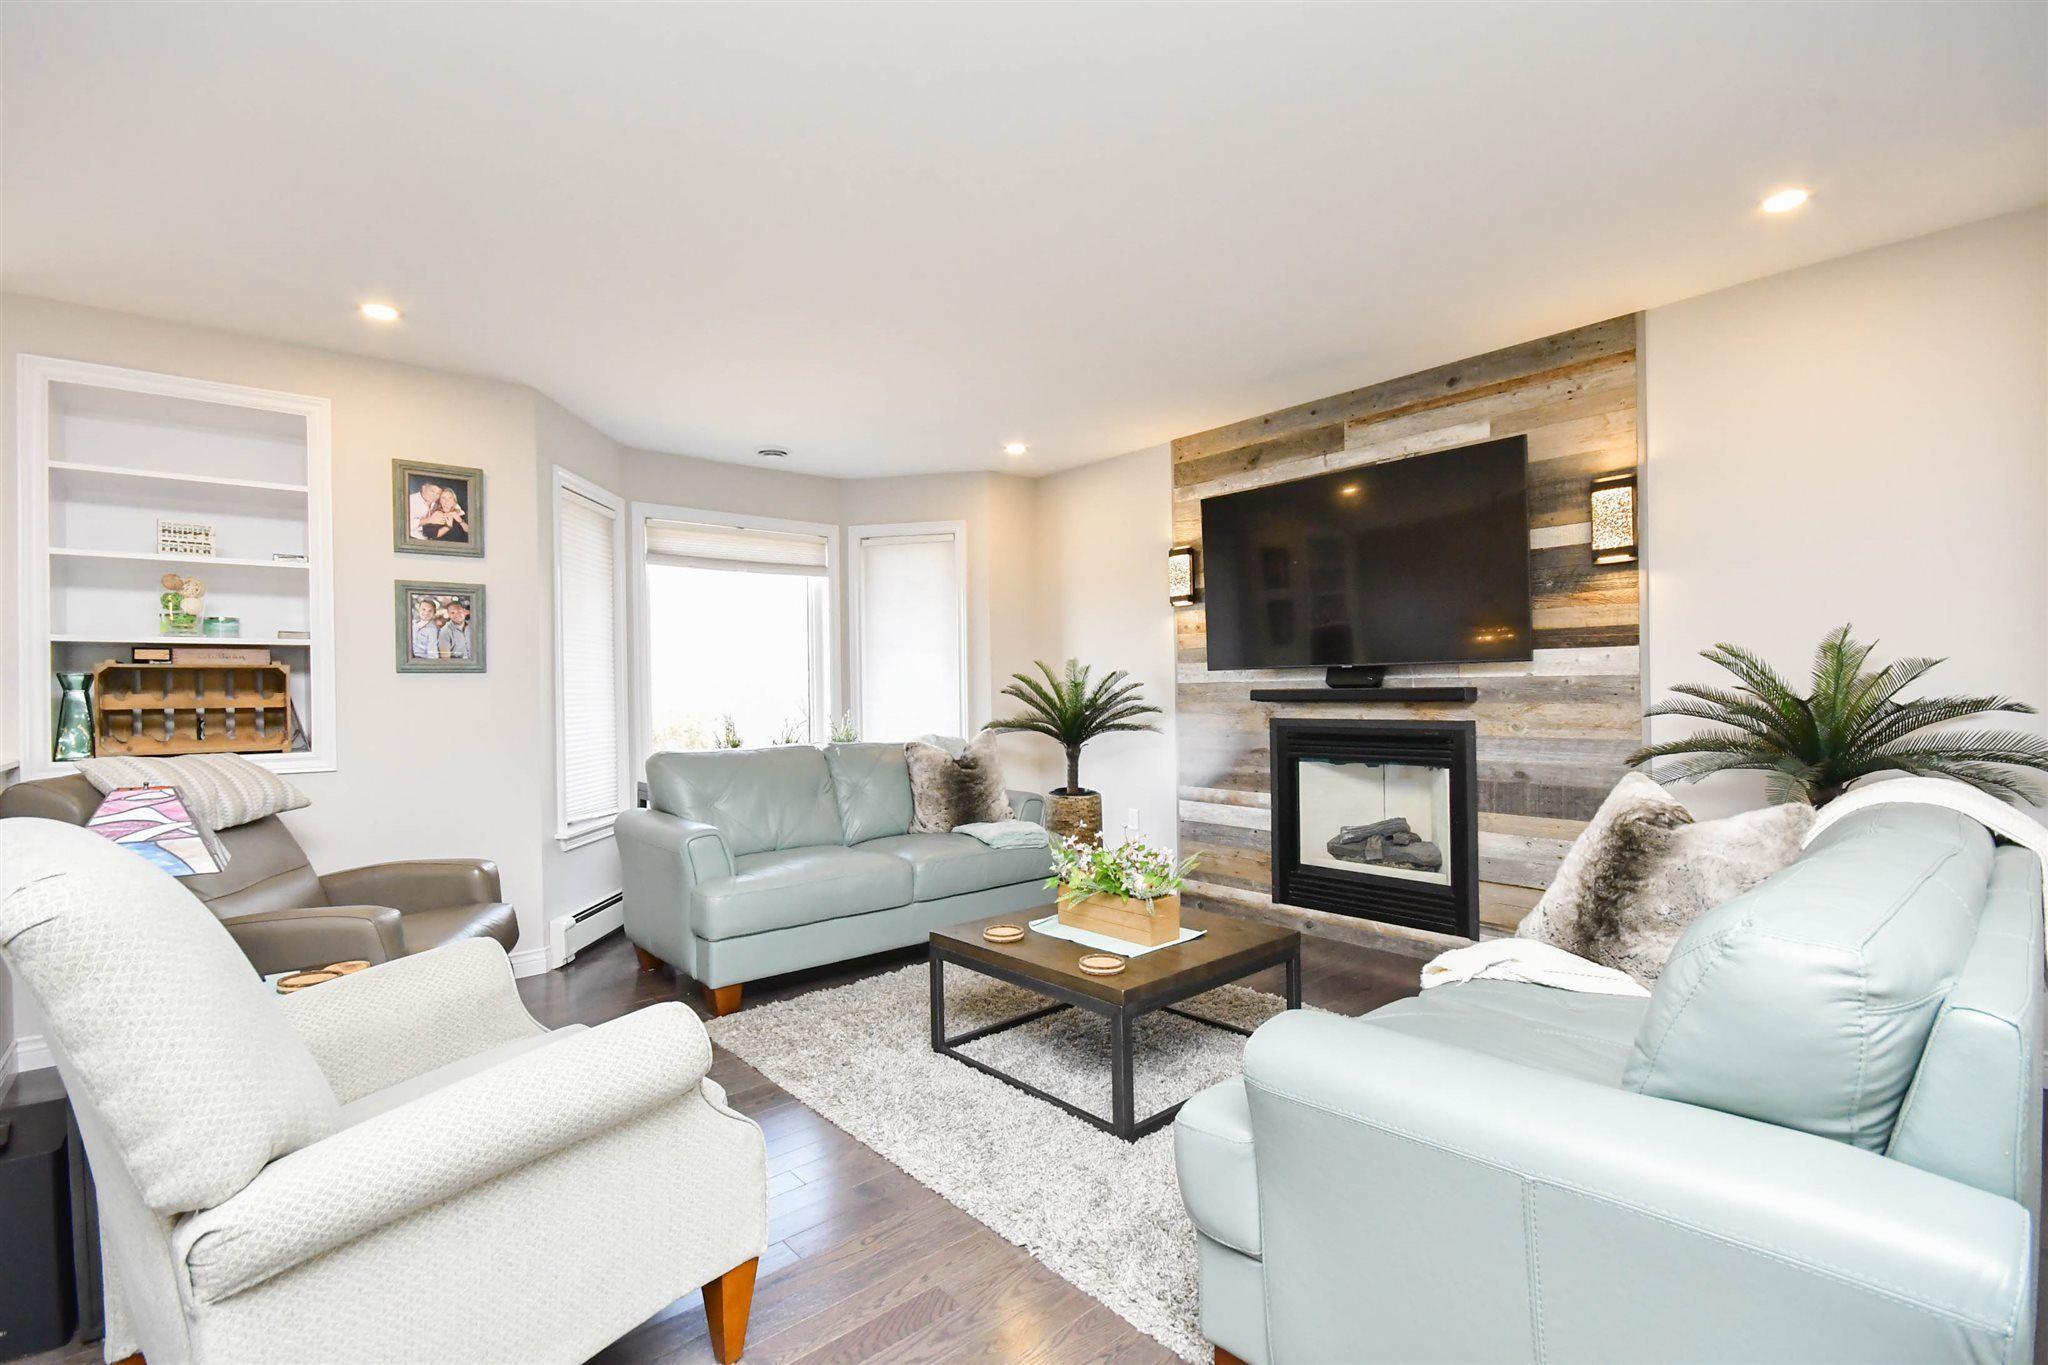 Photo 4: Photos: 17 Armstrong Court in Halifax: 5-Fairmount, Clayton Park, Rockingham Residential for sale (Halifax-Dartmouth)  : MLS®# 202105075